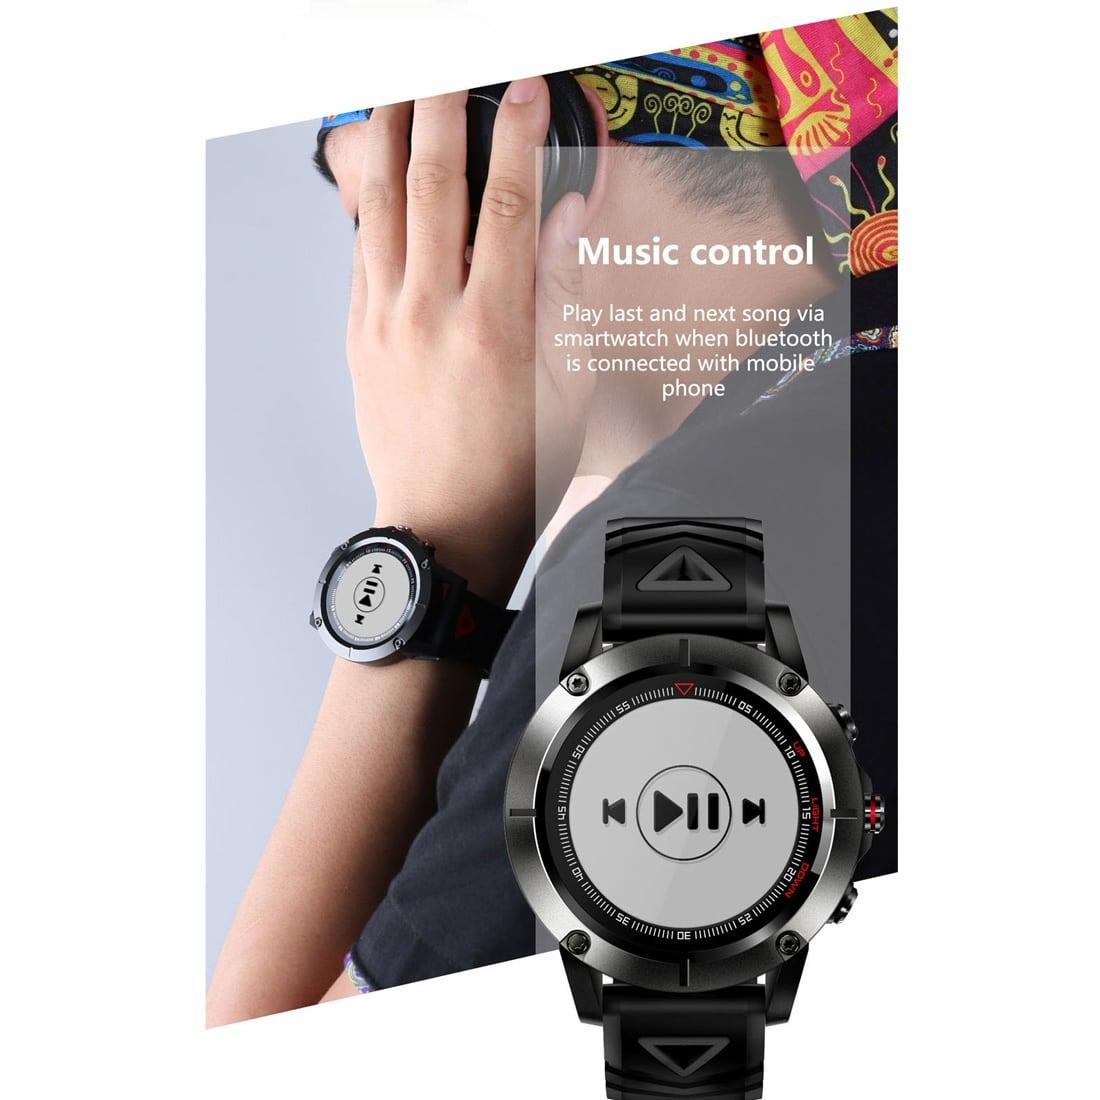 Bakeey G01 Smartwatch